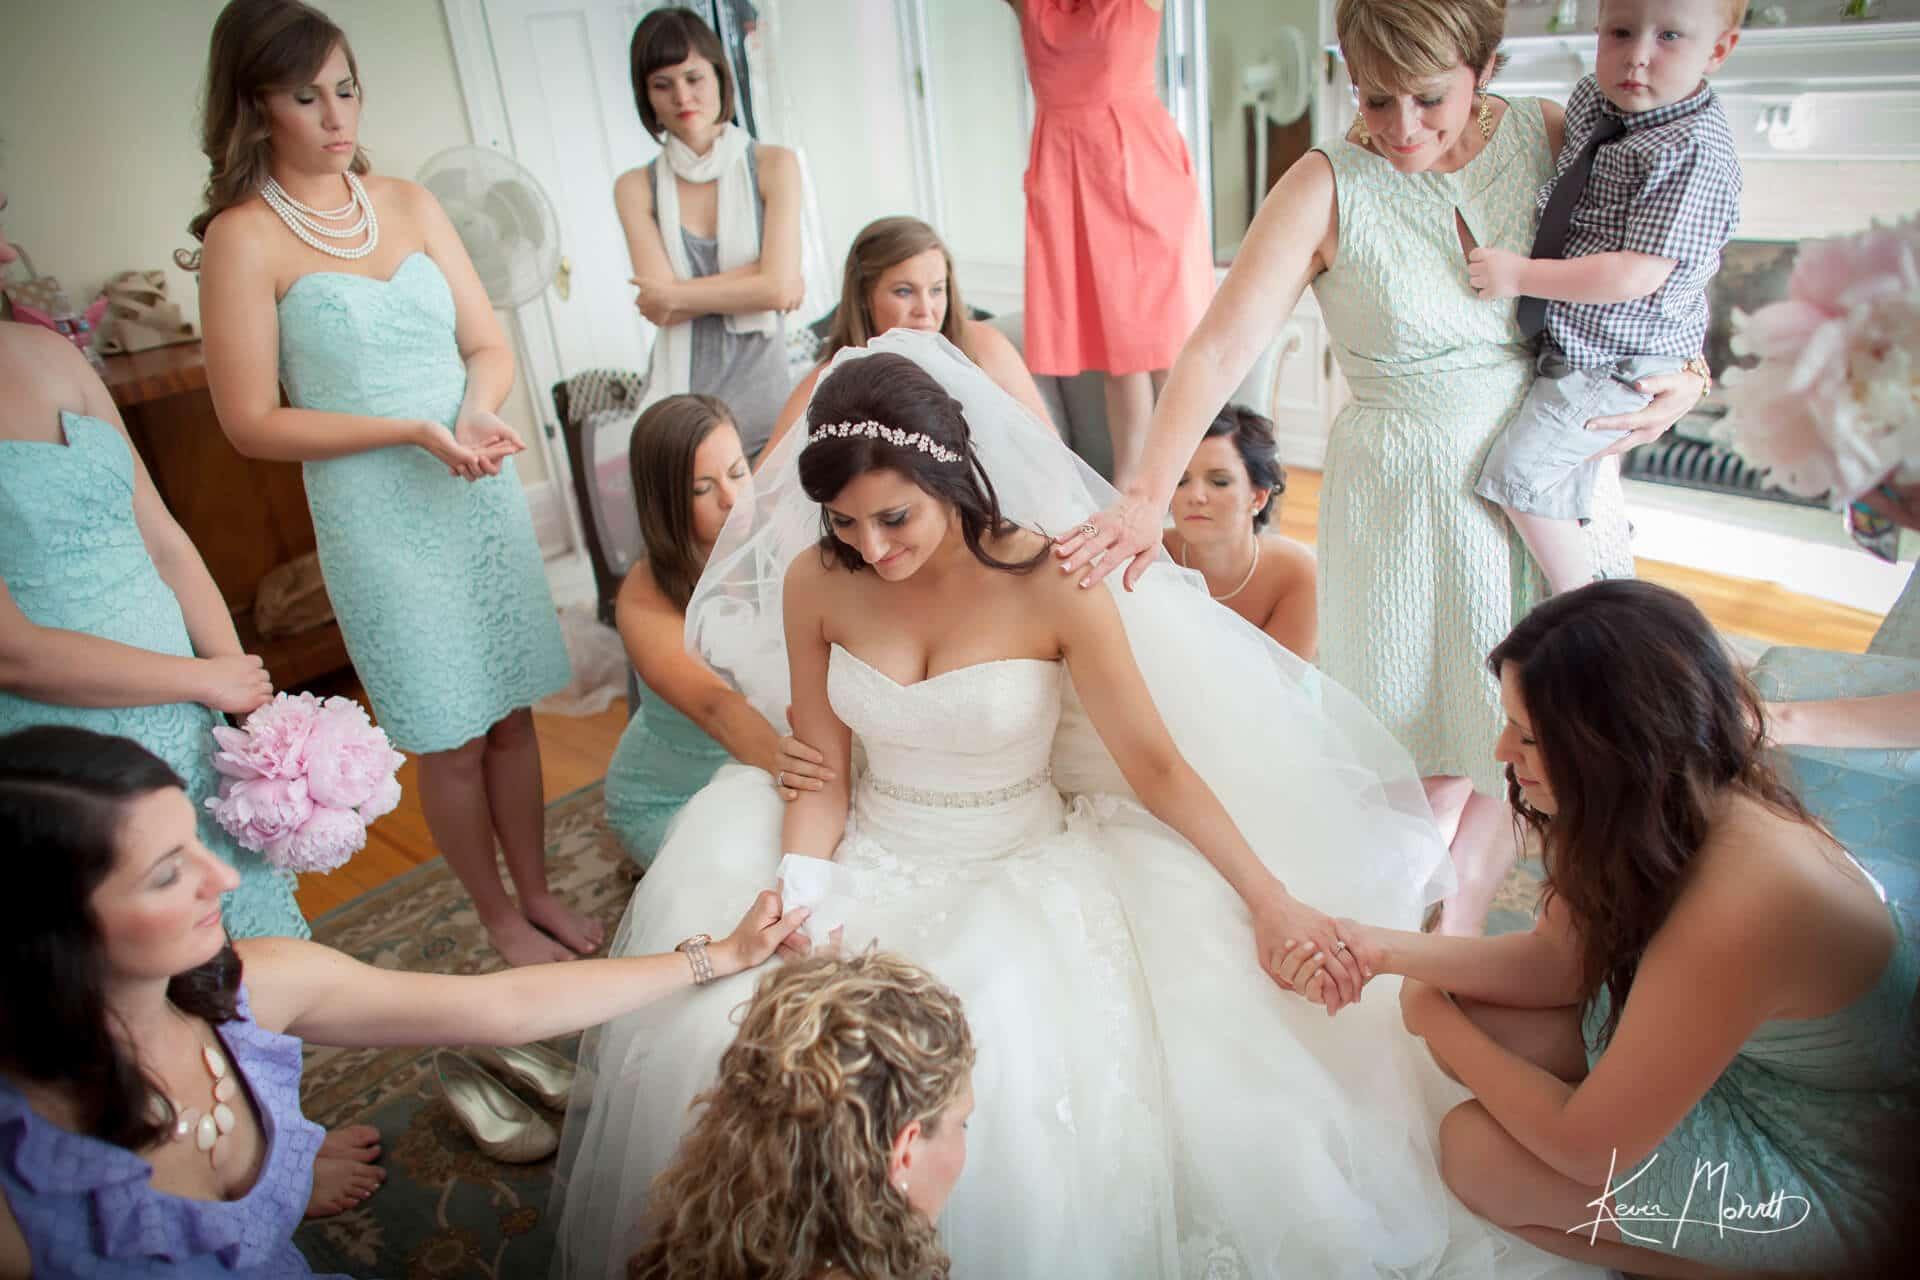 denver wedding photographer kevin